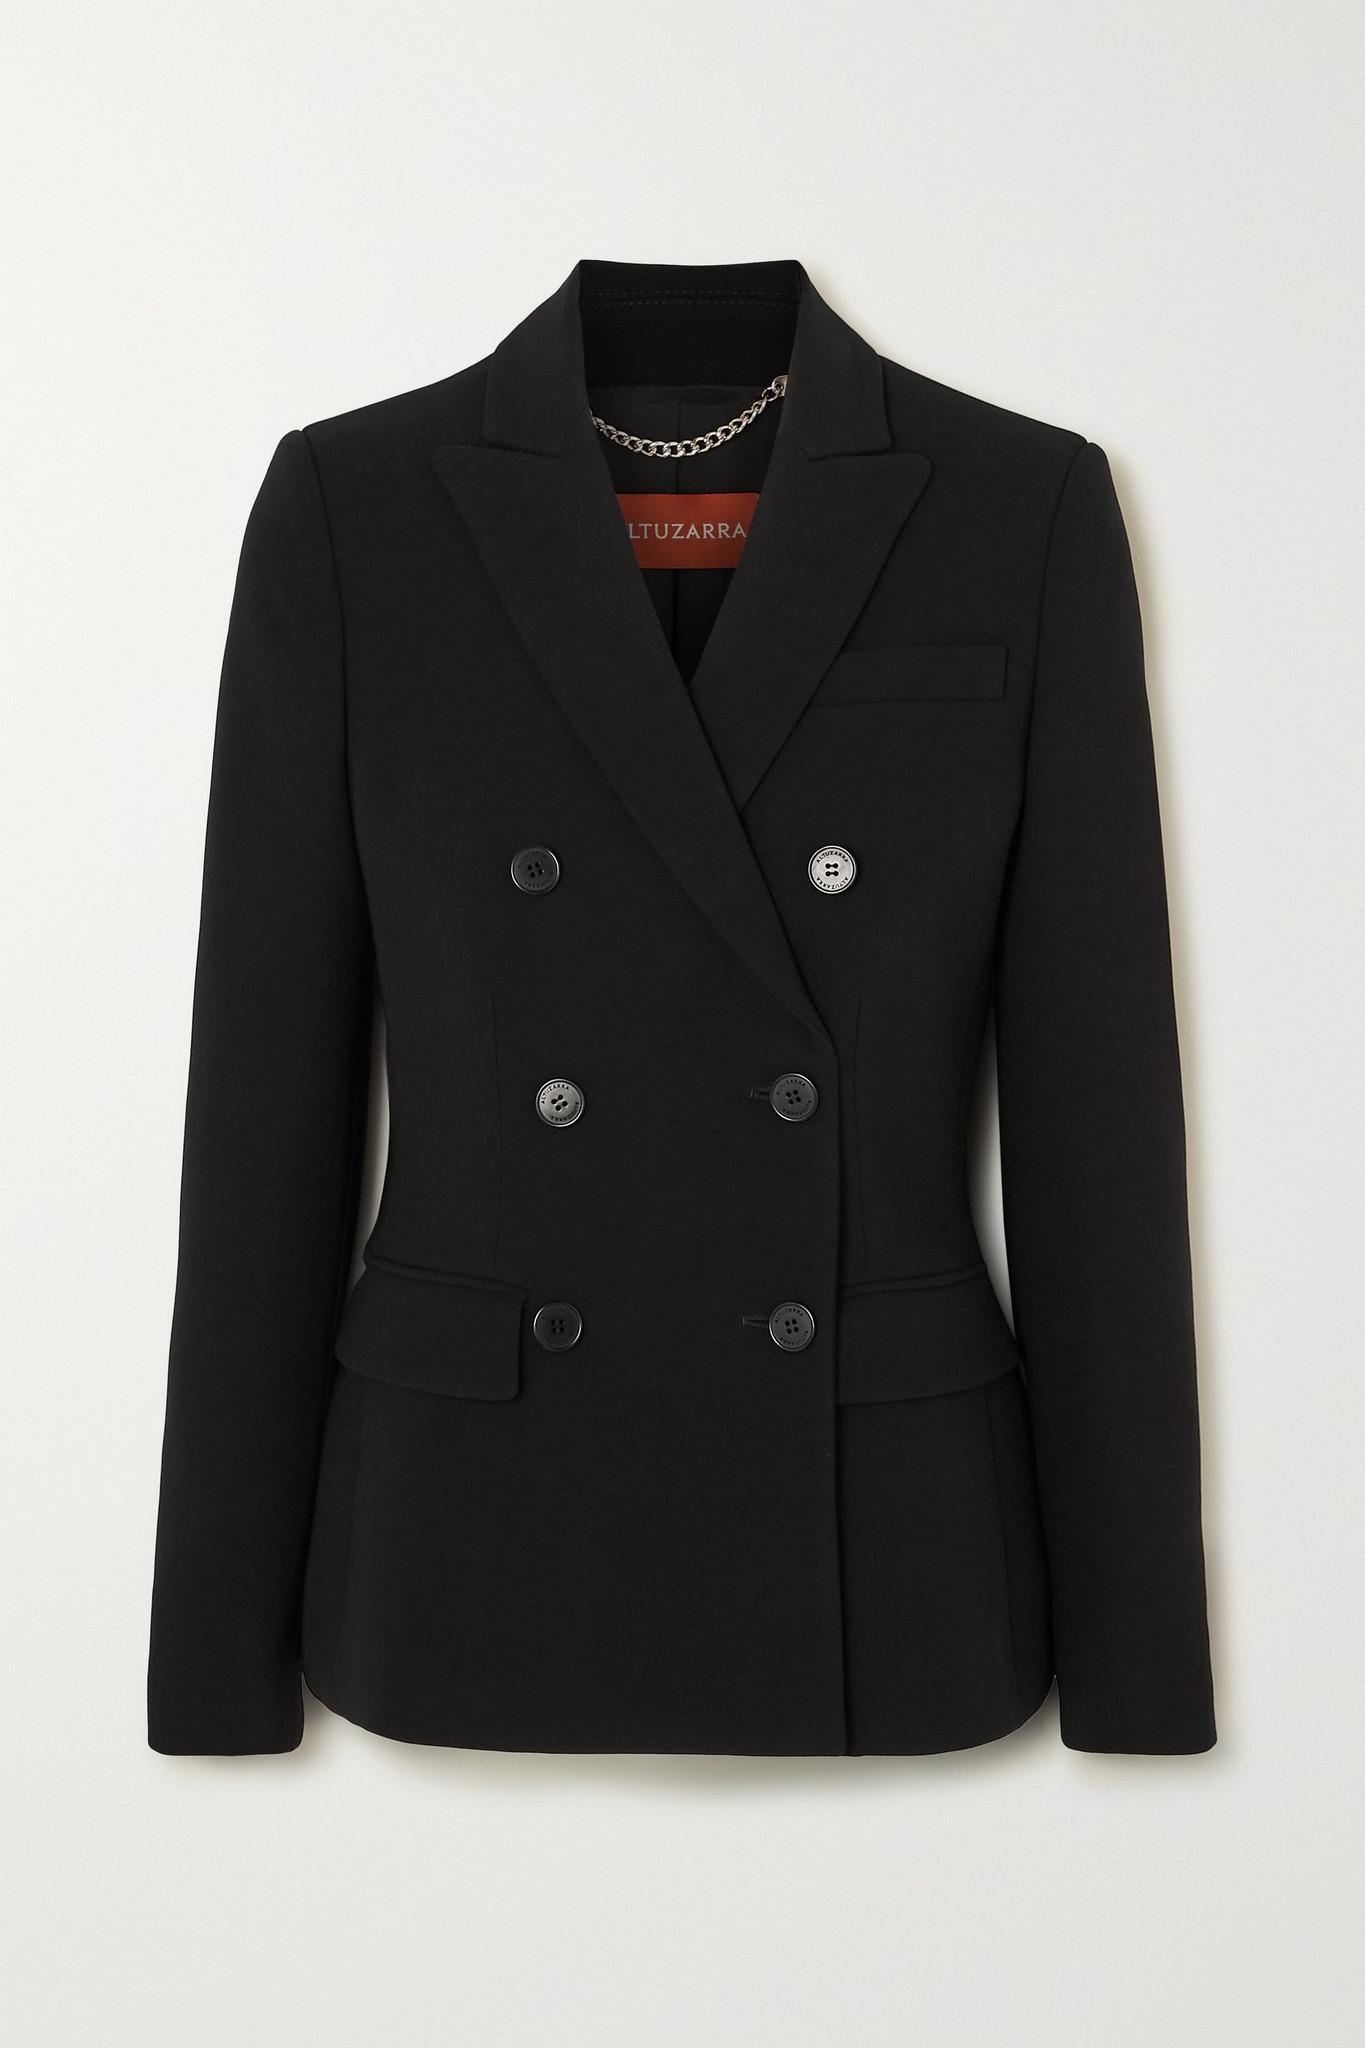 ALTUZARRA - Indiana 双排扣卡迪面料西装外套 - 黑色 - FR34